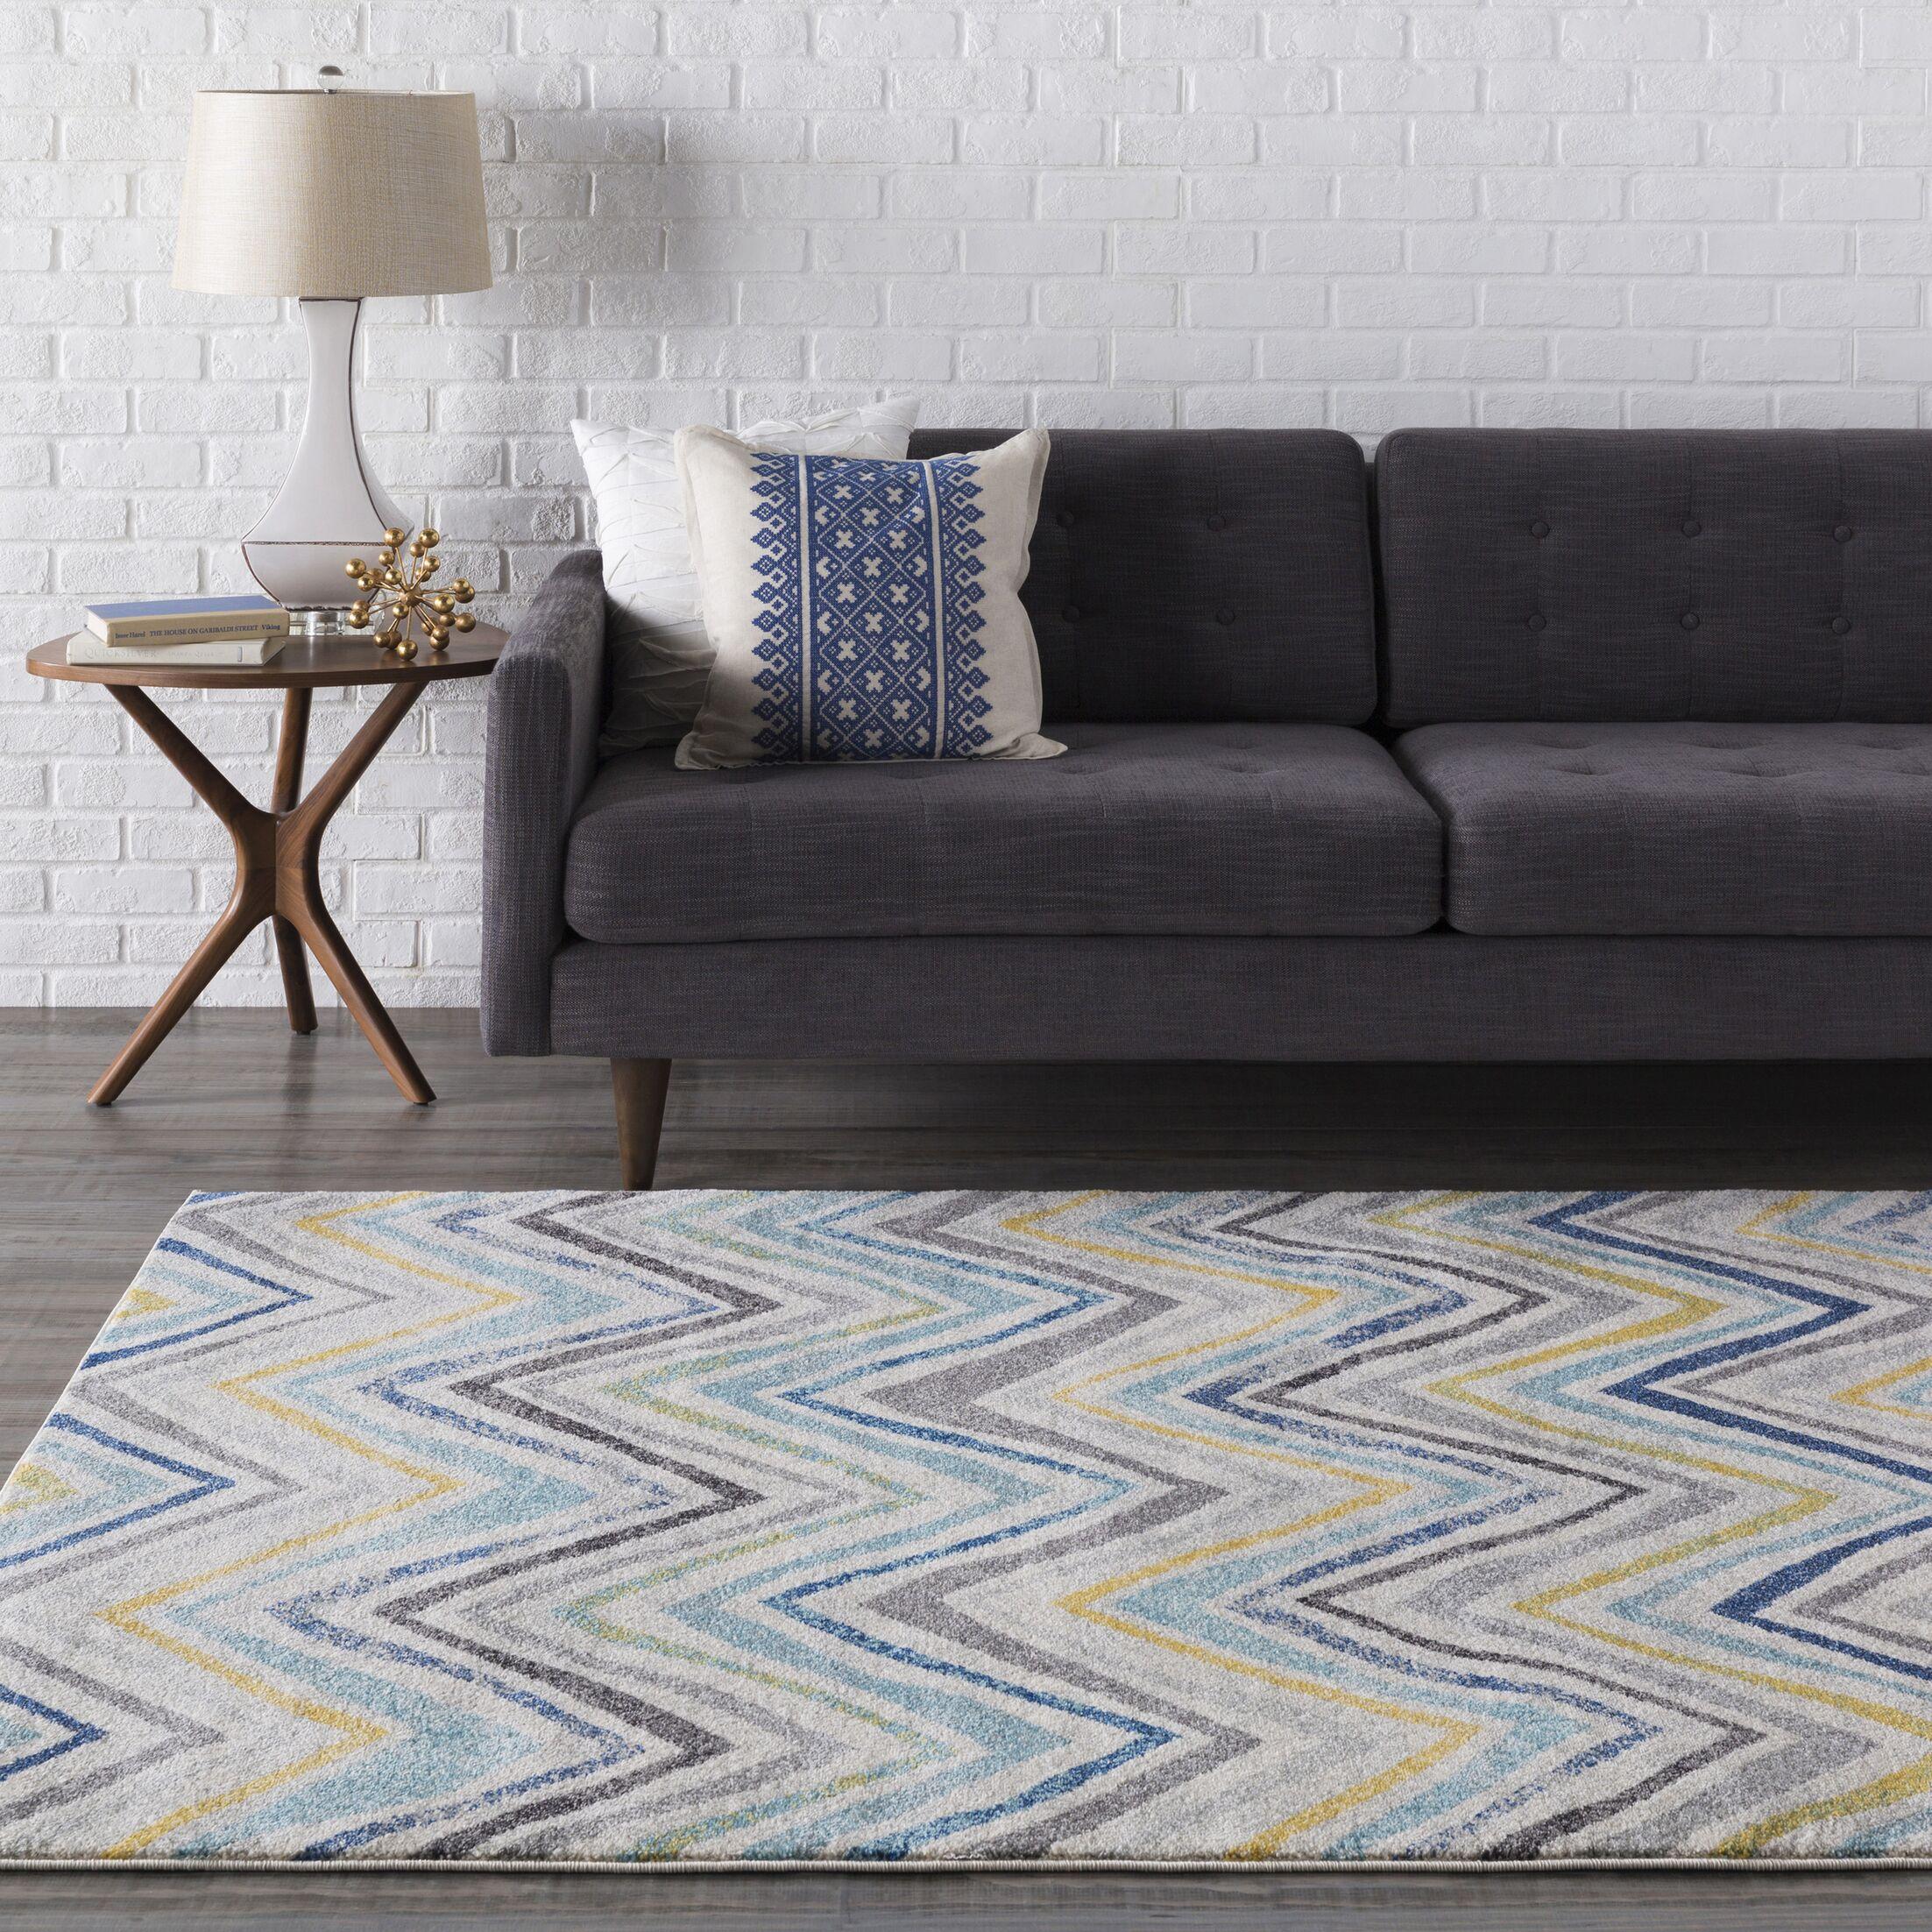 Evangelina Blue/Gray Area Rug Rug Size: Rectangle 9'3